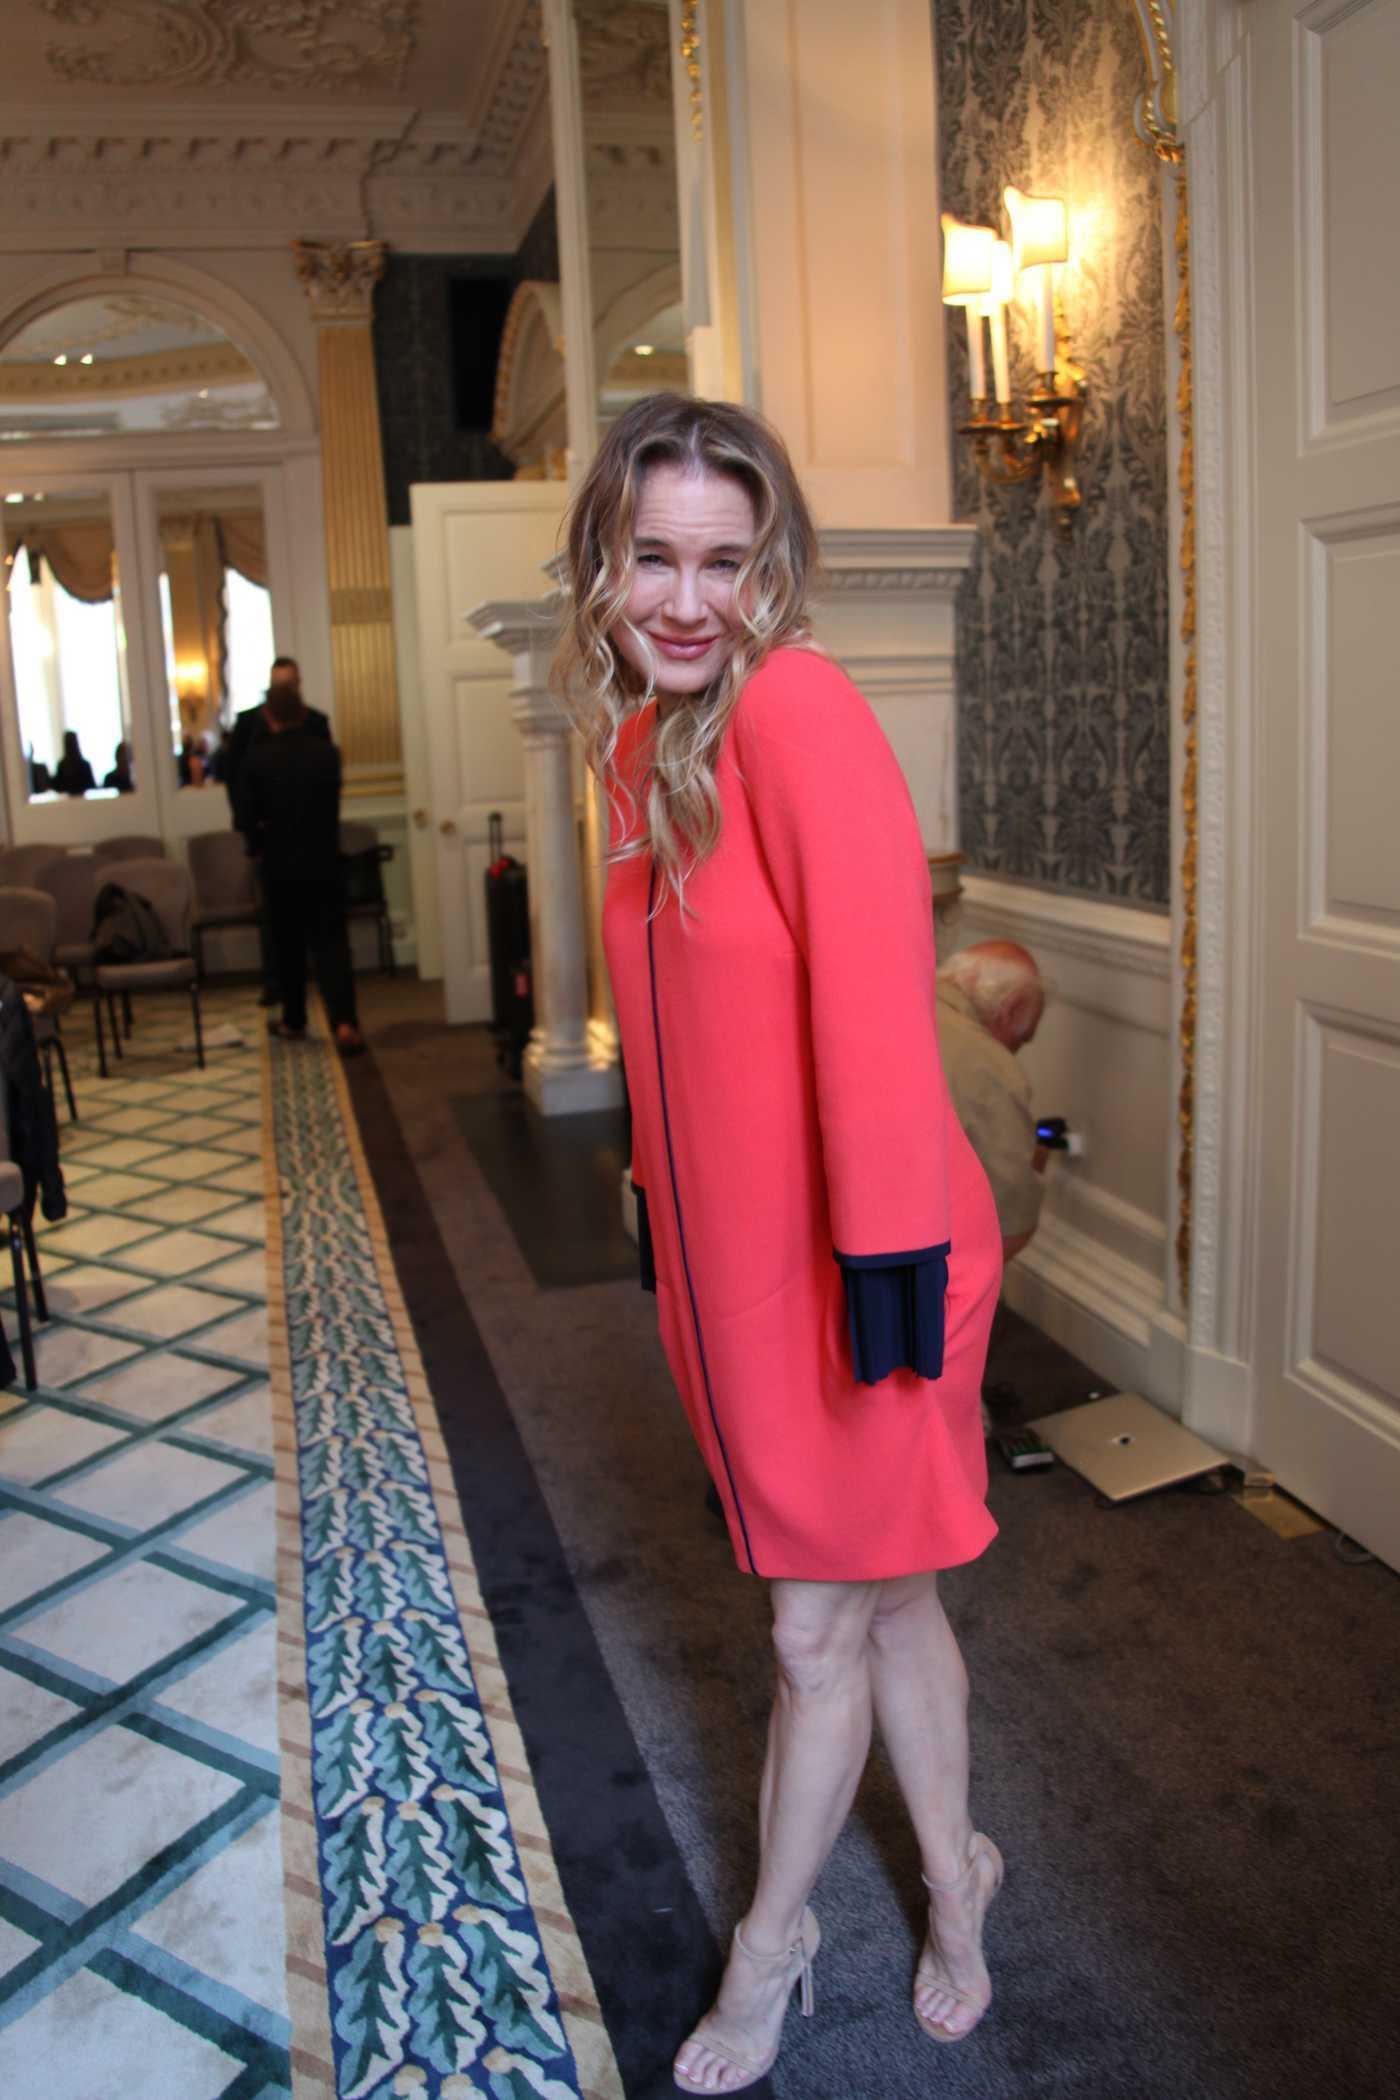 Renee Zellweger at the Bridget Jones Baby Press Conference at the Claridge Hotel in London 08/30/2016